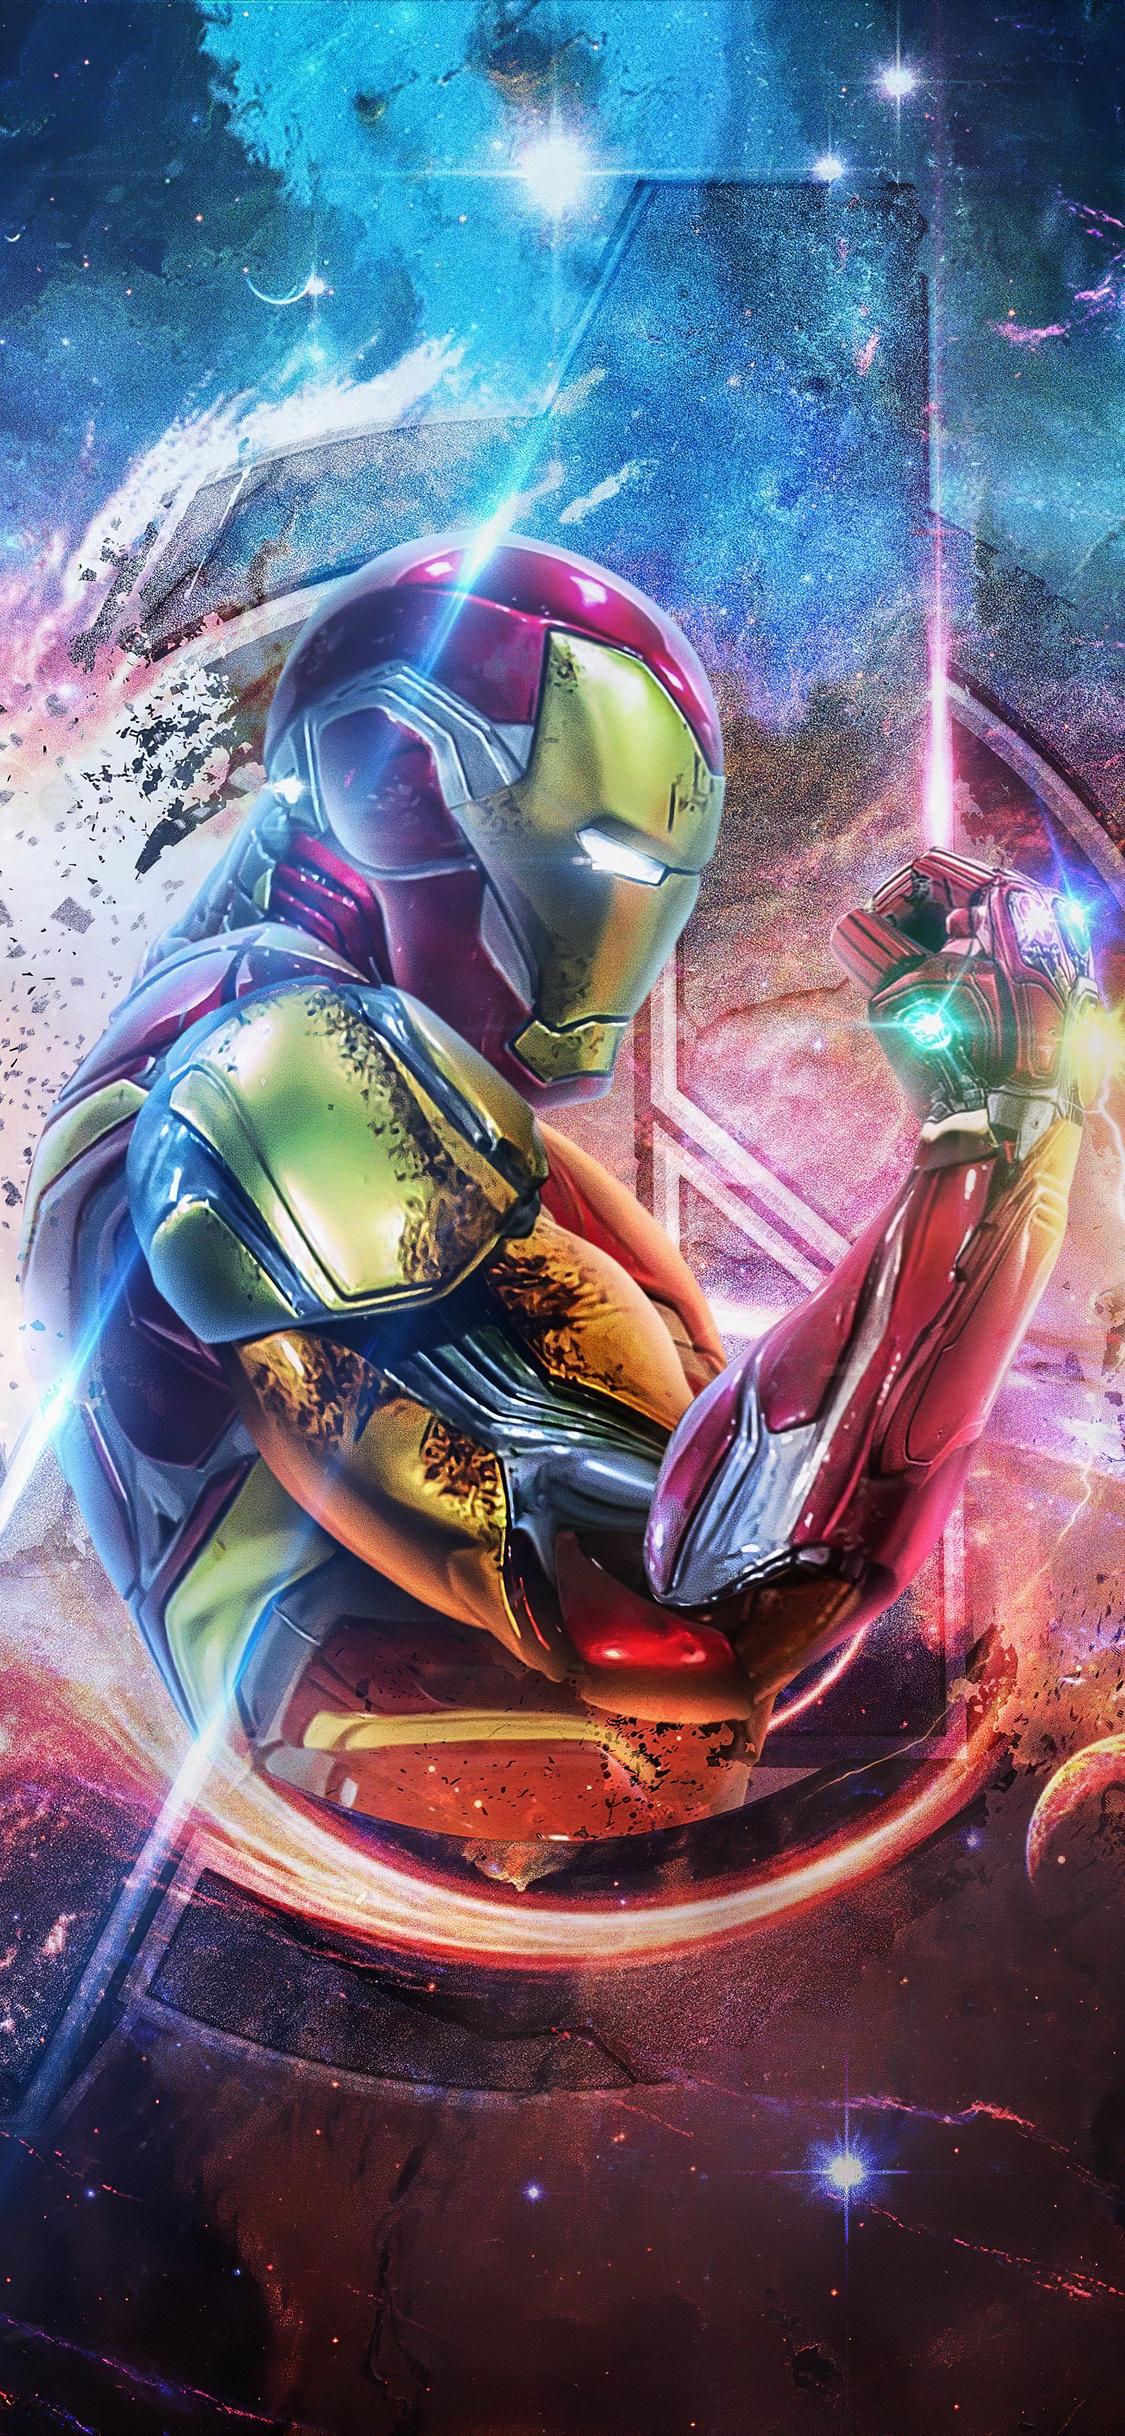 Iphone x wallpaper 4k iron man